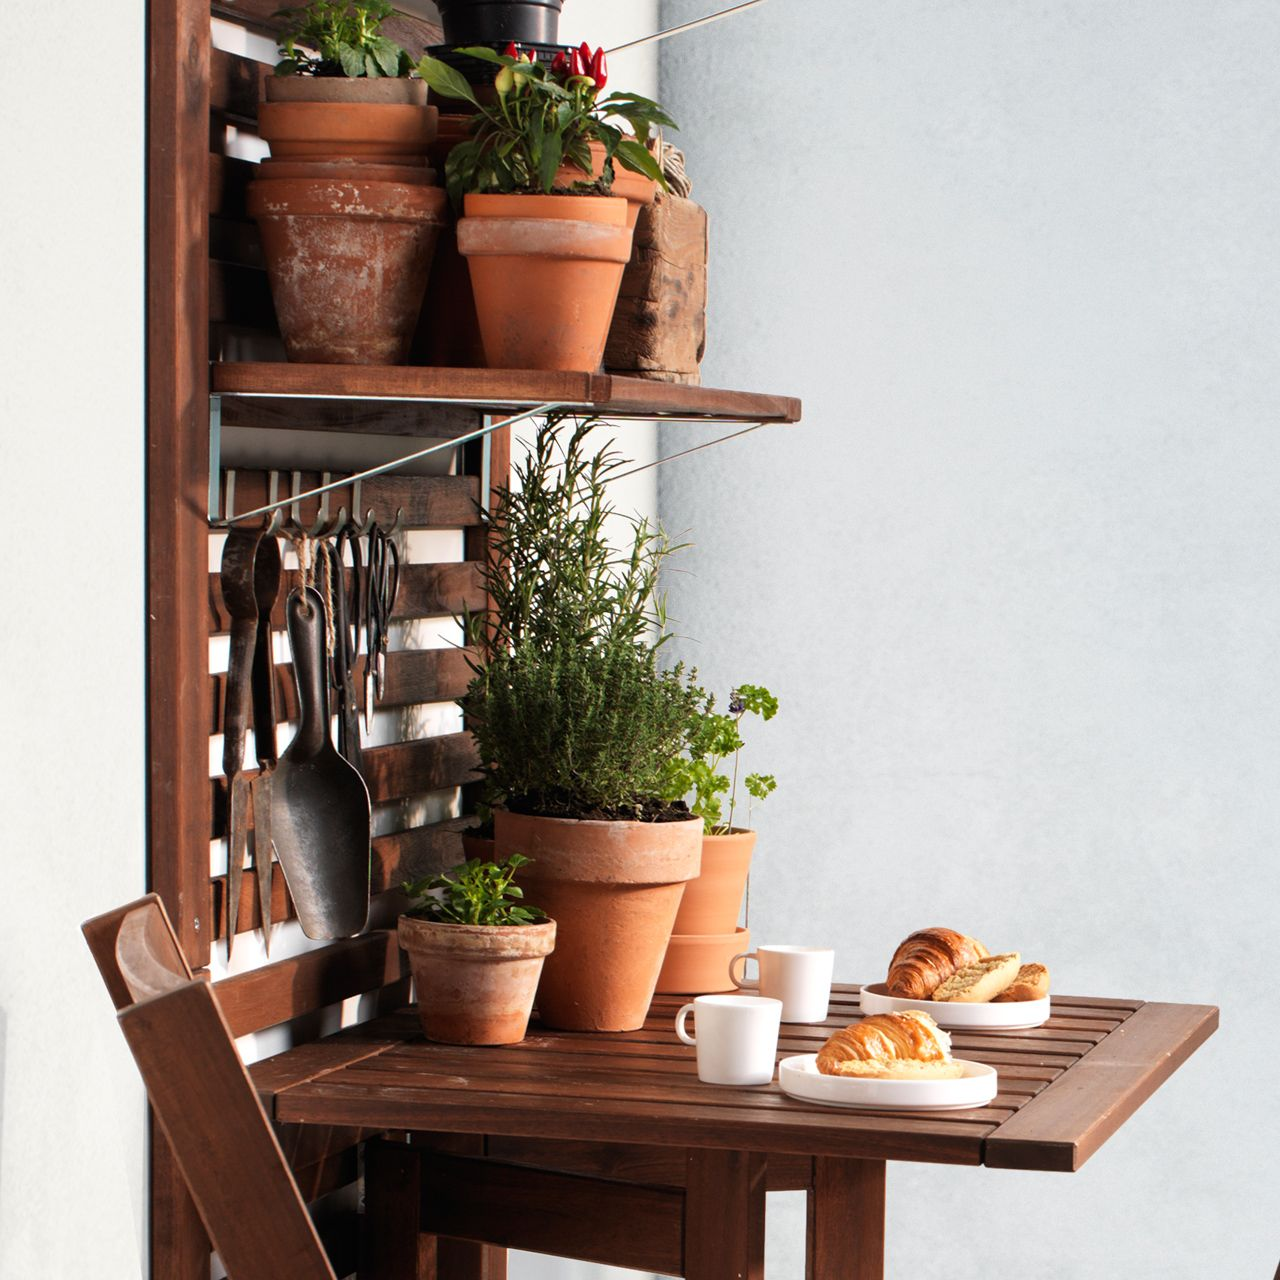 ÄPPLARÖ Wall panel+gateleg table, outdoor, brown stained